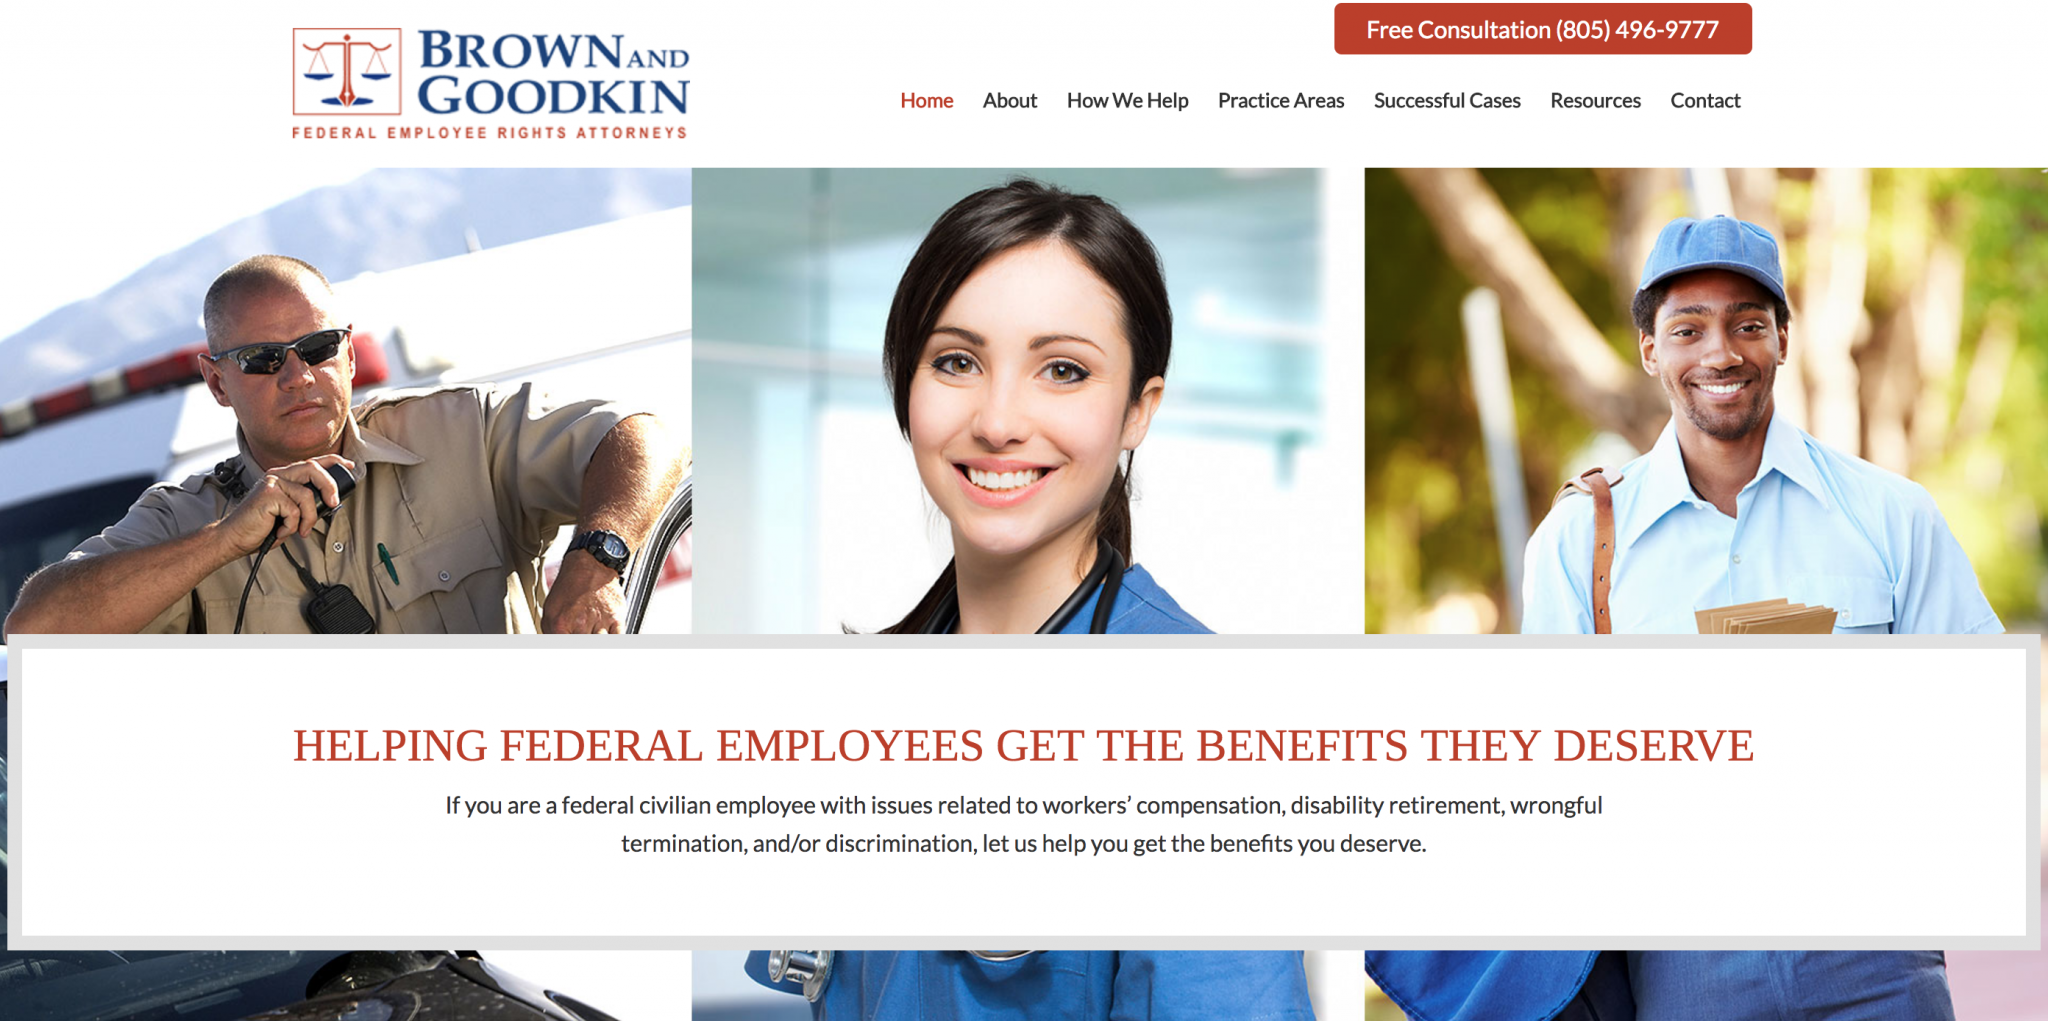 Brown and Goodkin website